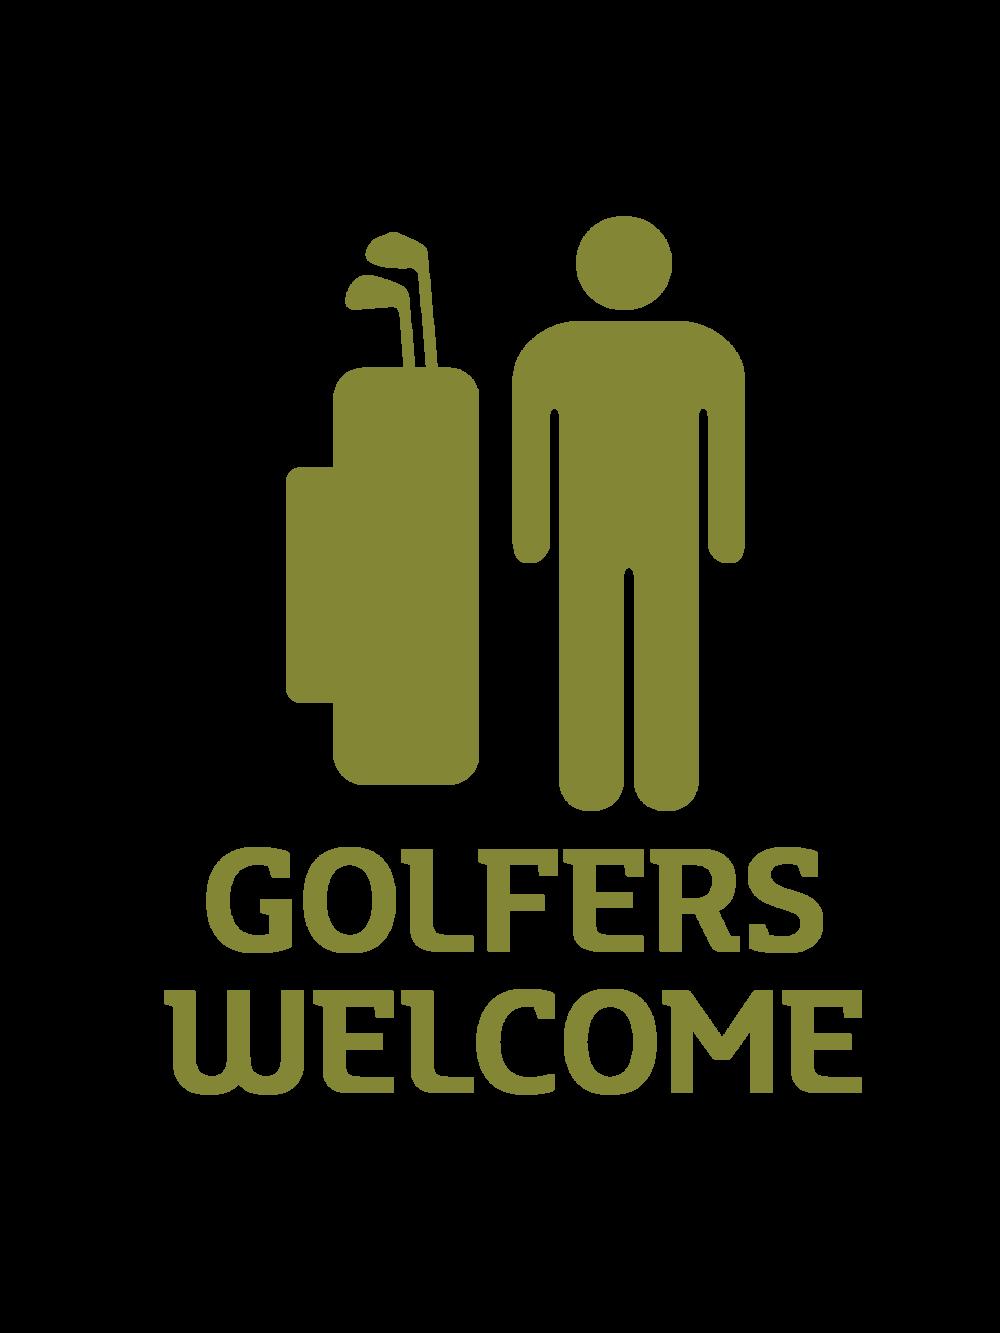 Golfers welcome.jpg